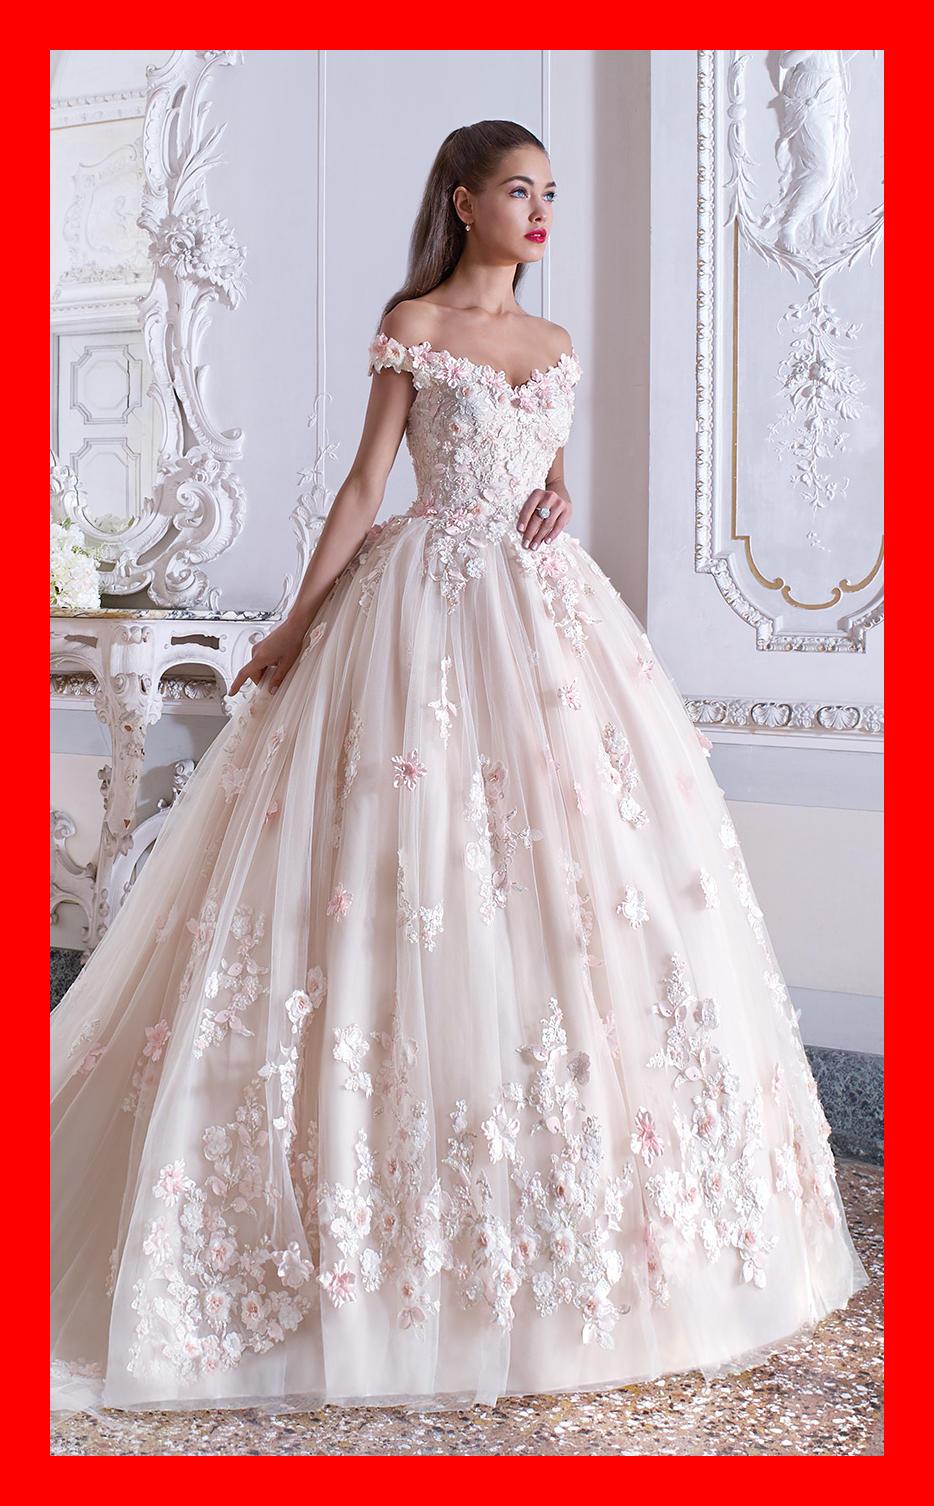 Wedding dresses: Demetrios, Platinum and Destination collections